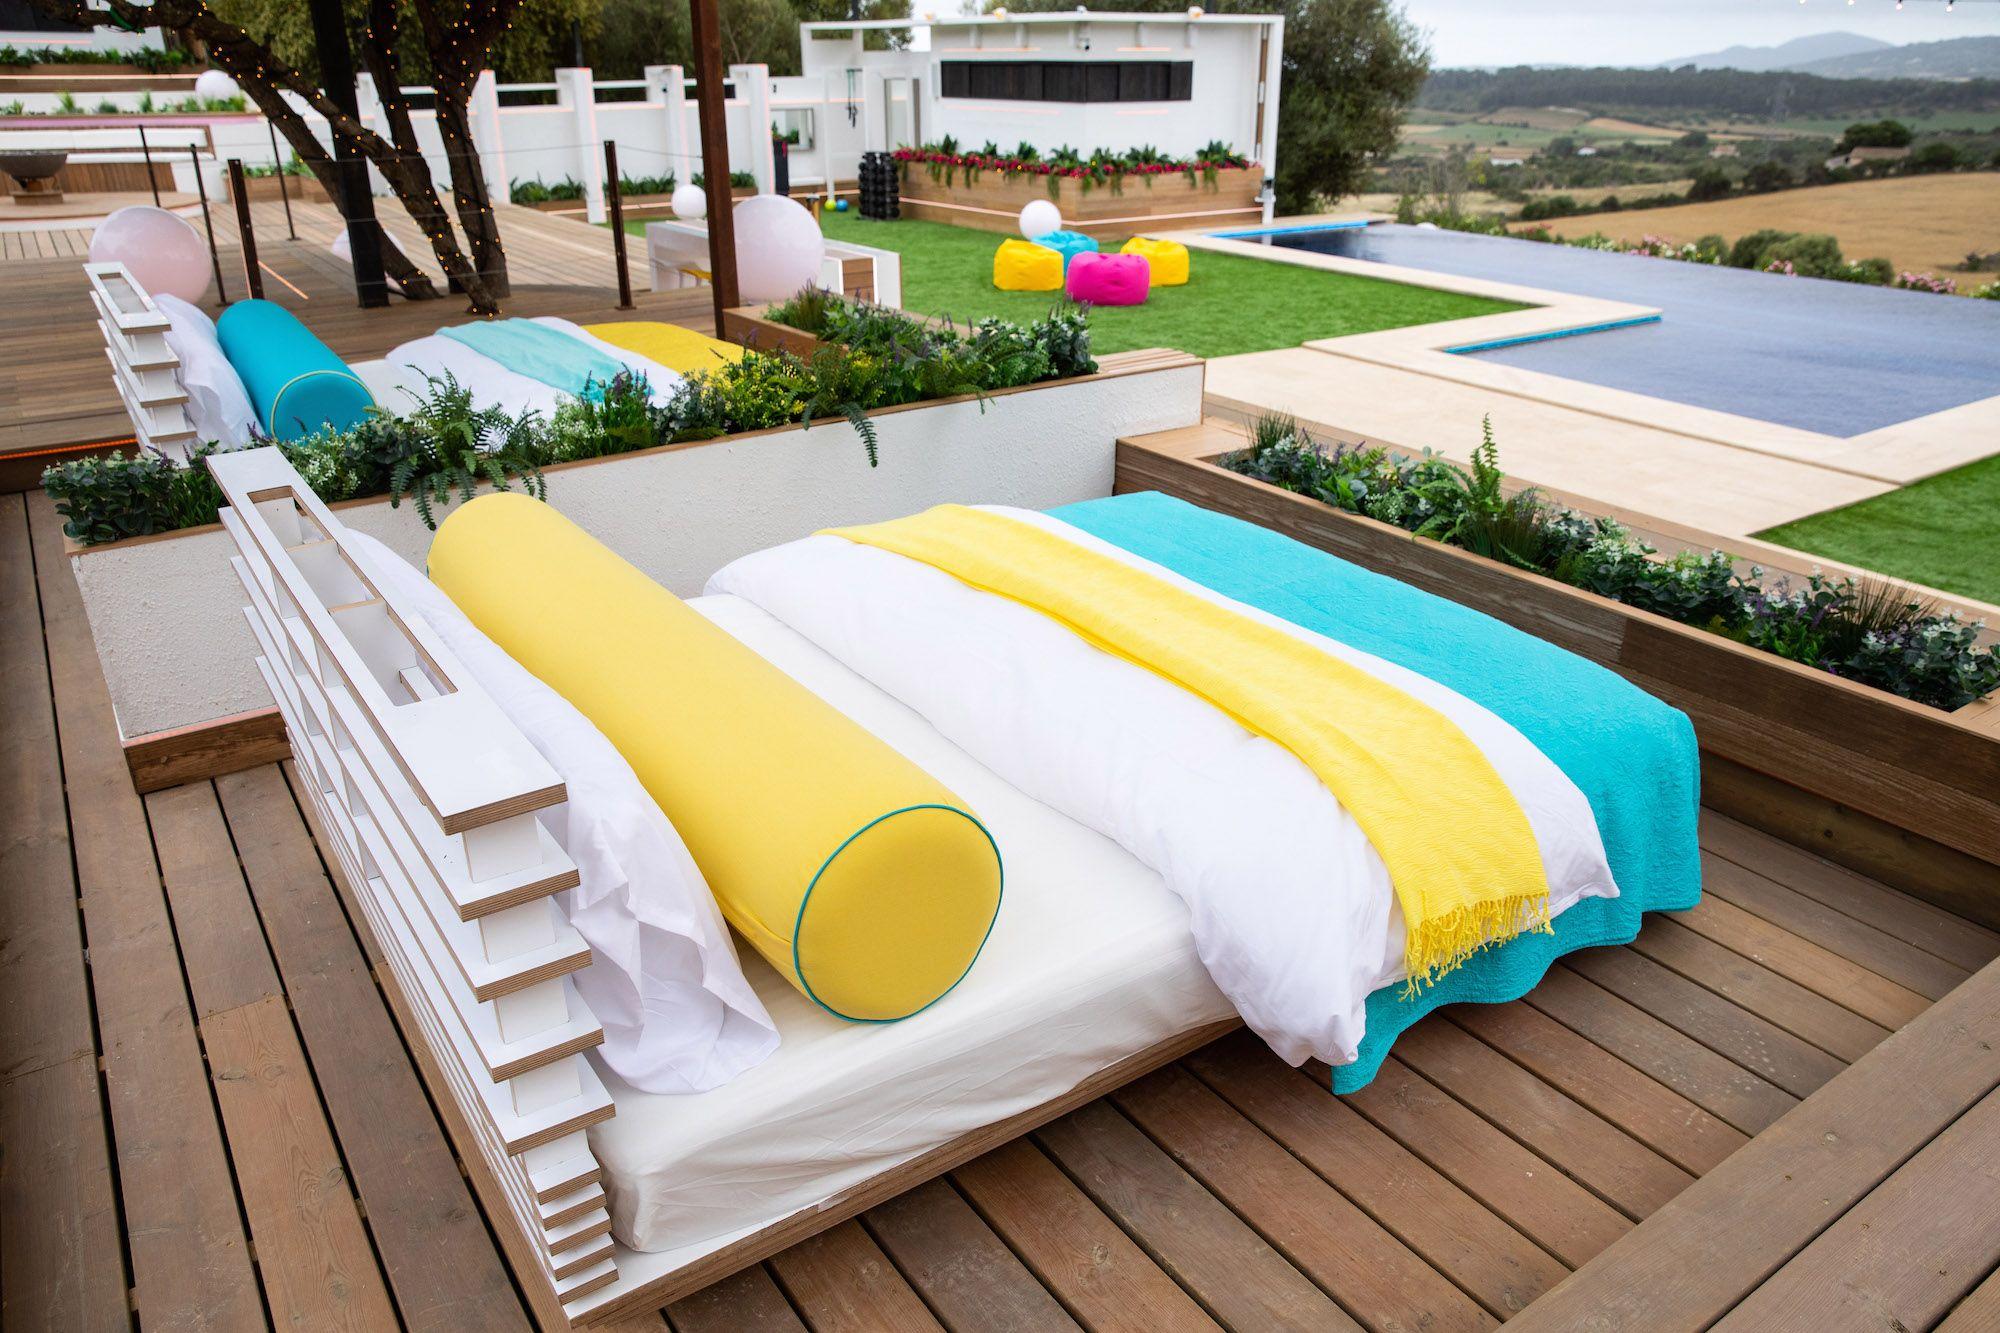 Image may contain: Love Island villa, Love Island, location, 2019, Rug, Bridge, Boardwalk, Hotel, Pool, Building, Wood, Water